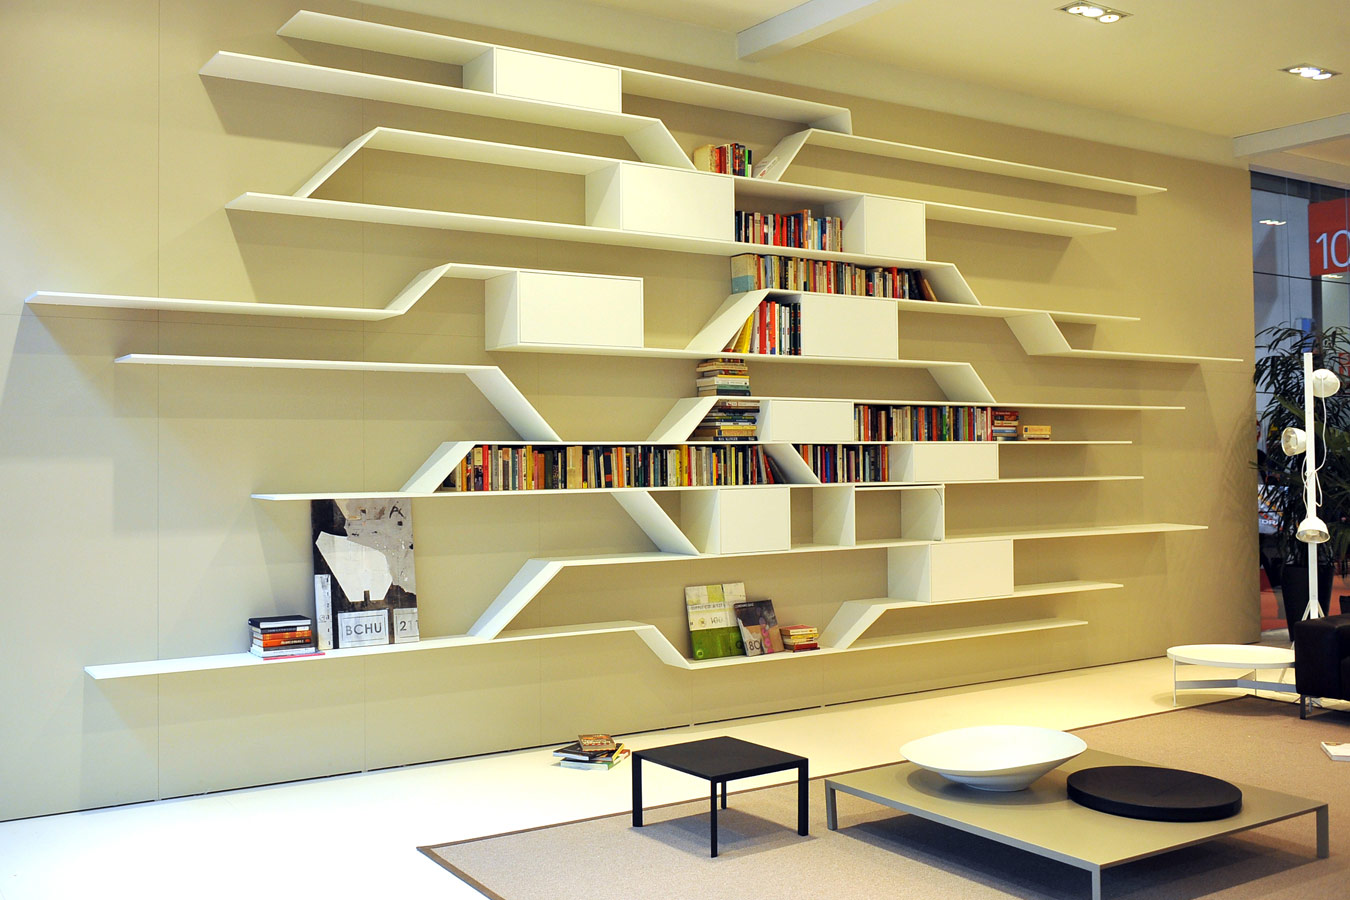 Decoratie woonkamer modern for for Deco woonkamer moderne woonkamer